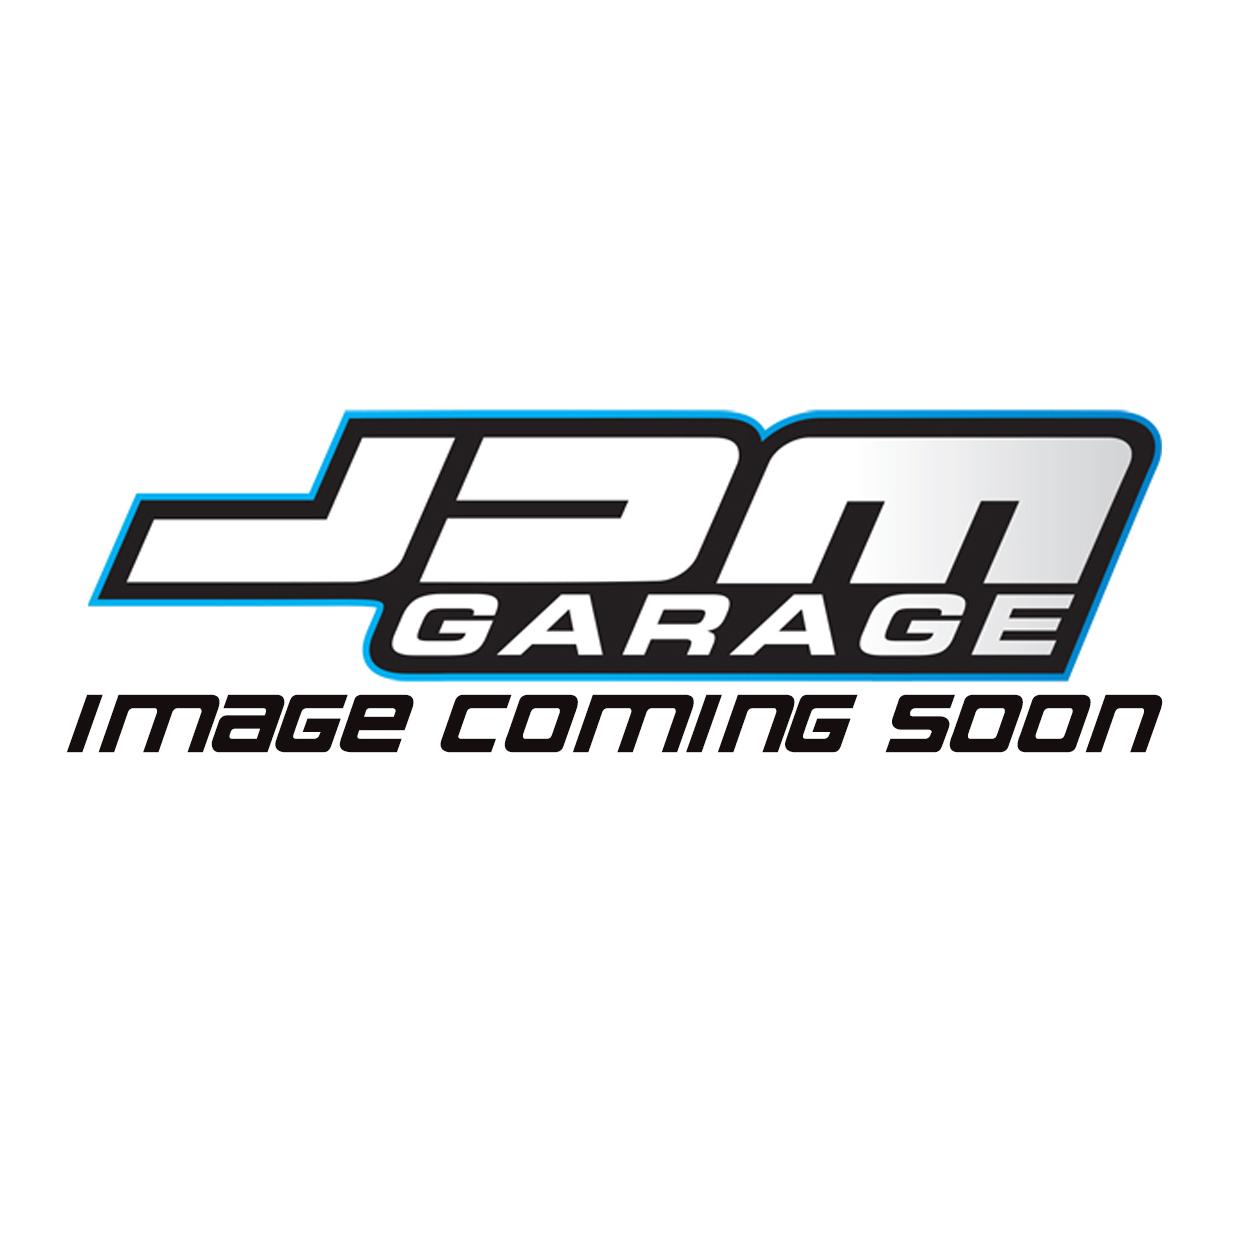 Genuine Nissan RB25DET NEO Engine Harness Loom For Skyline R34 GTT Stagea WC34 RS4